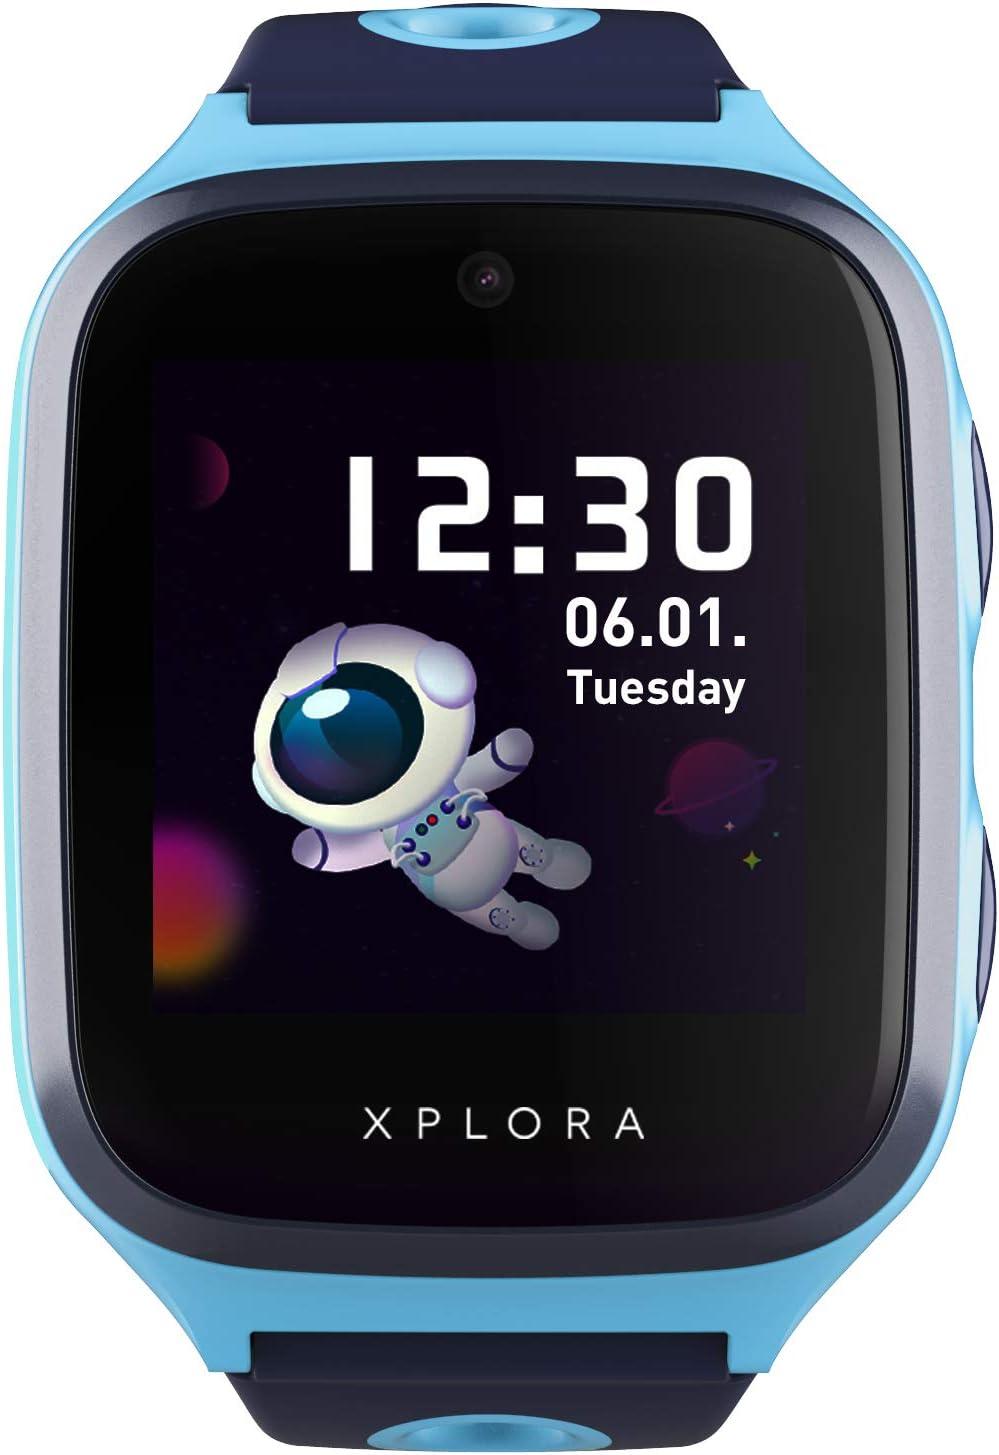 616lb-xopzL._AC_SL1500_ Smartwatch Xplora 4